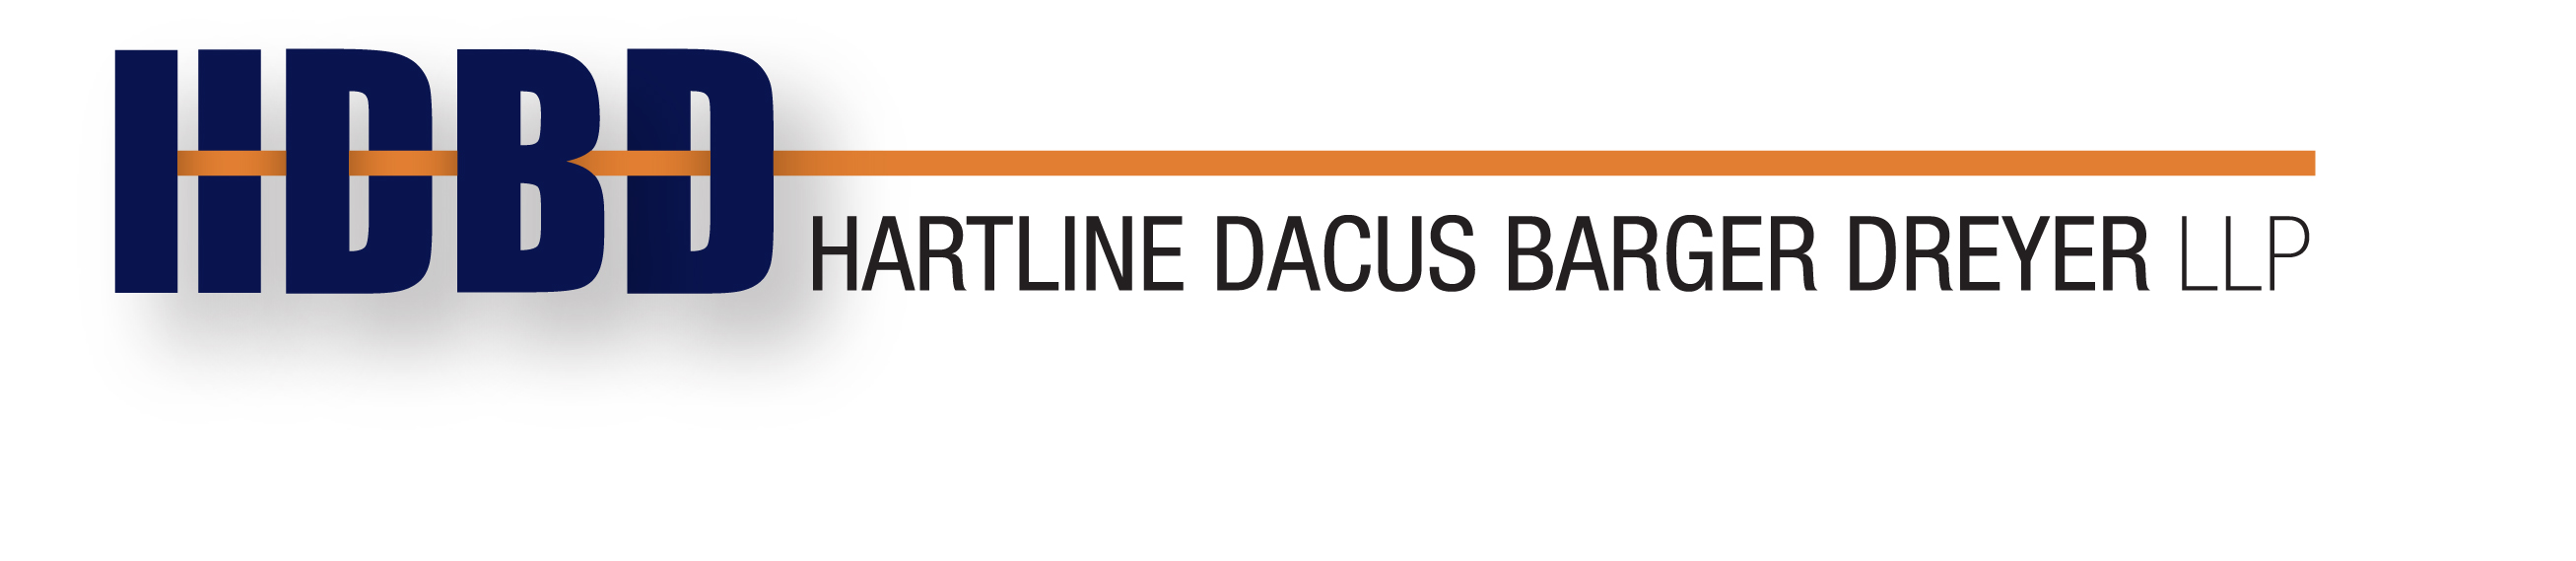 Hartline Dacus Barger Dreyer LLP Successfully Defends American Honda